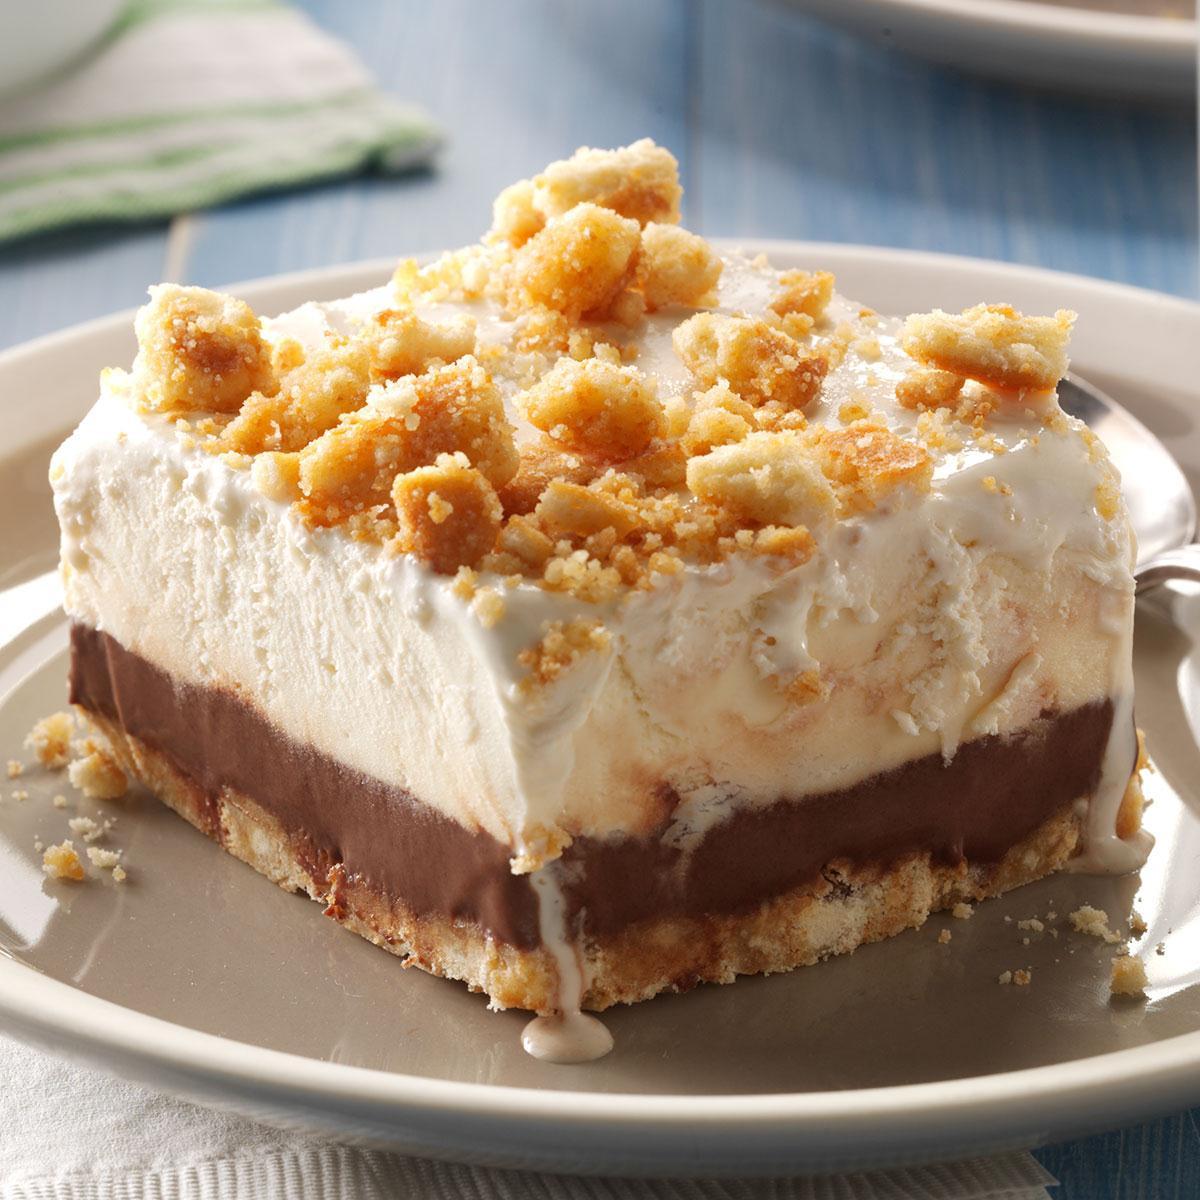 Easy Dessert Ideas  Easy Ice Cream Sundae Dessert Recipe